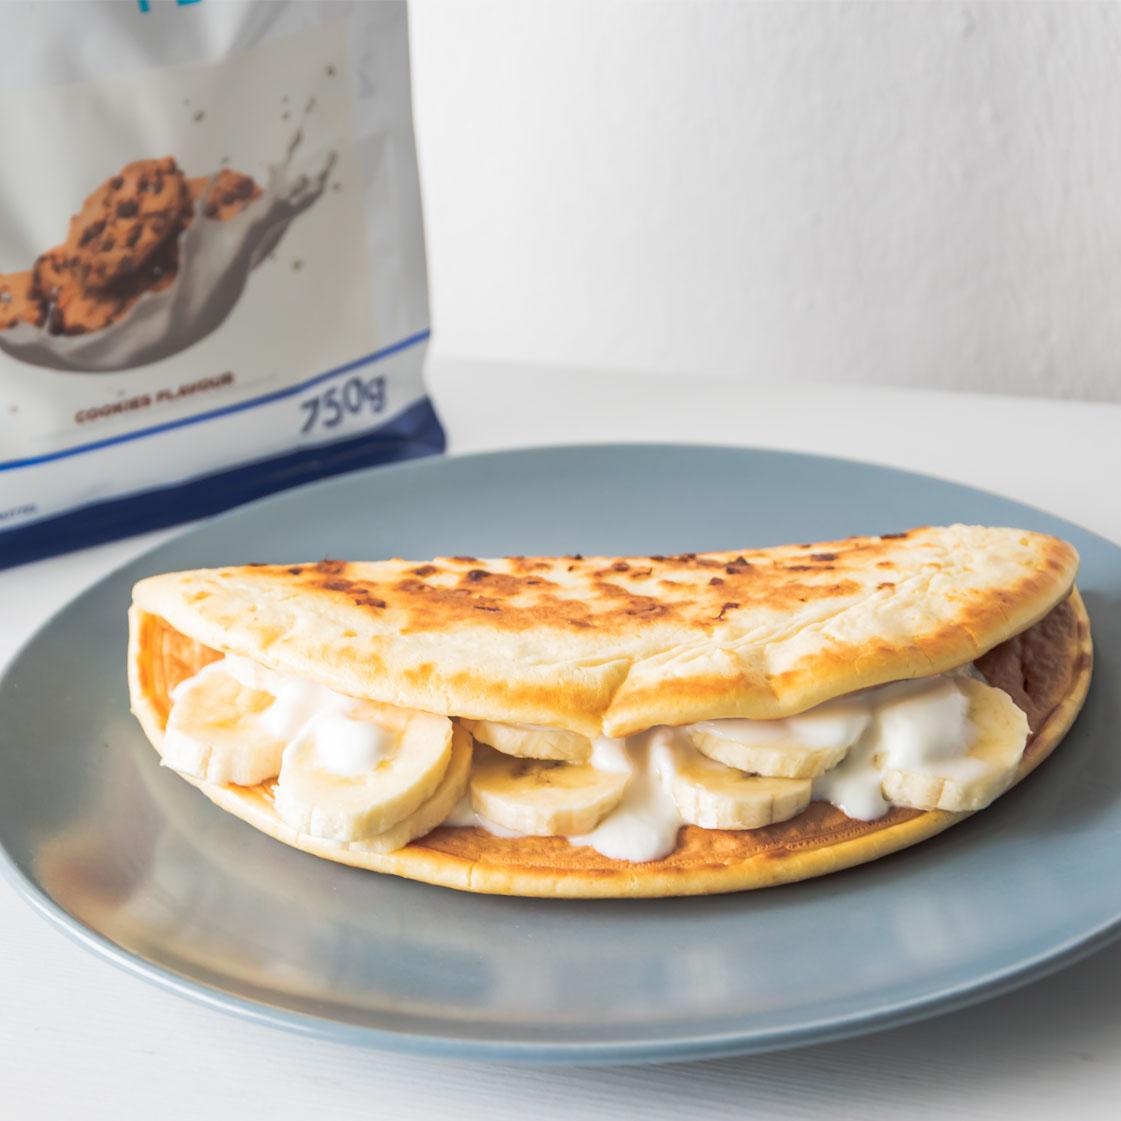 Omlet bananowy fit – aż 55 gram białka!